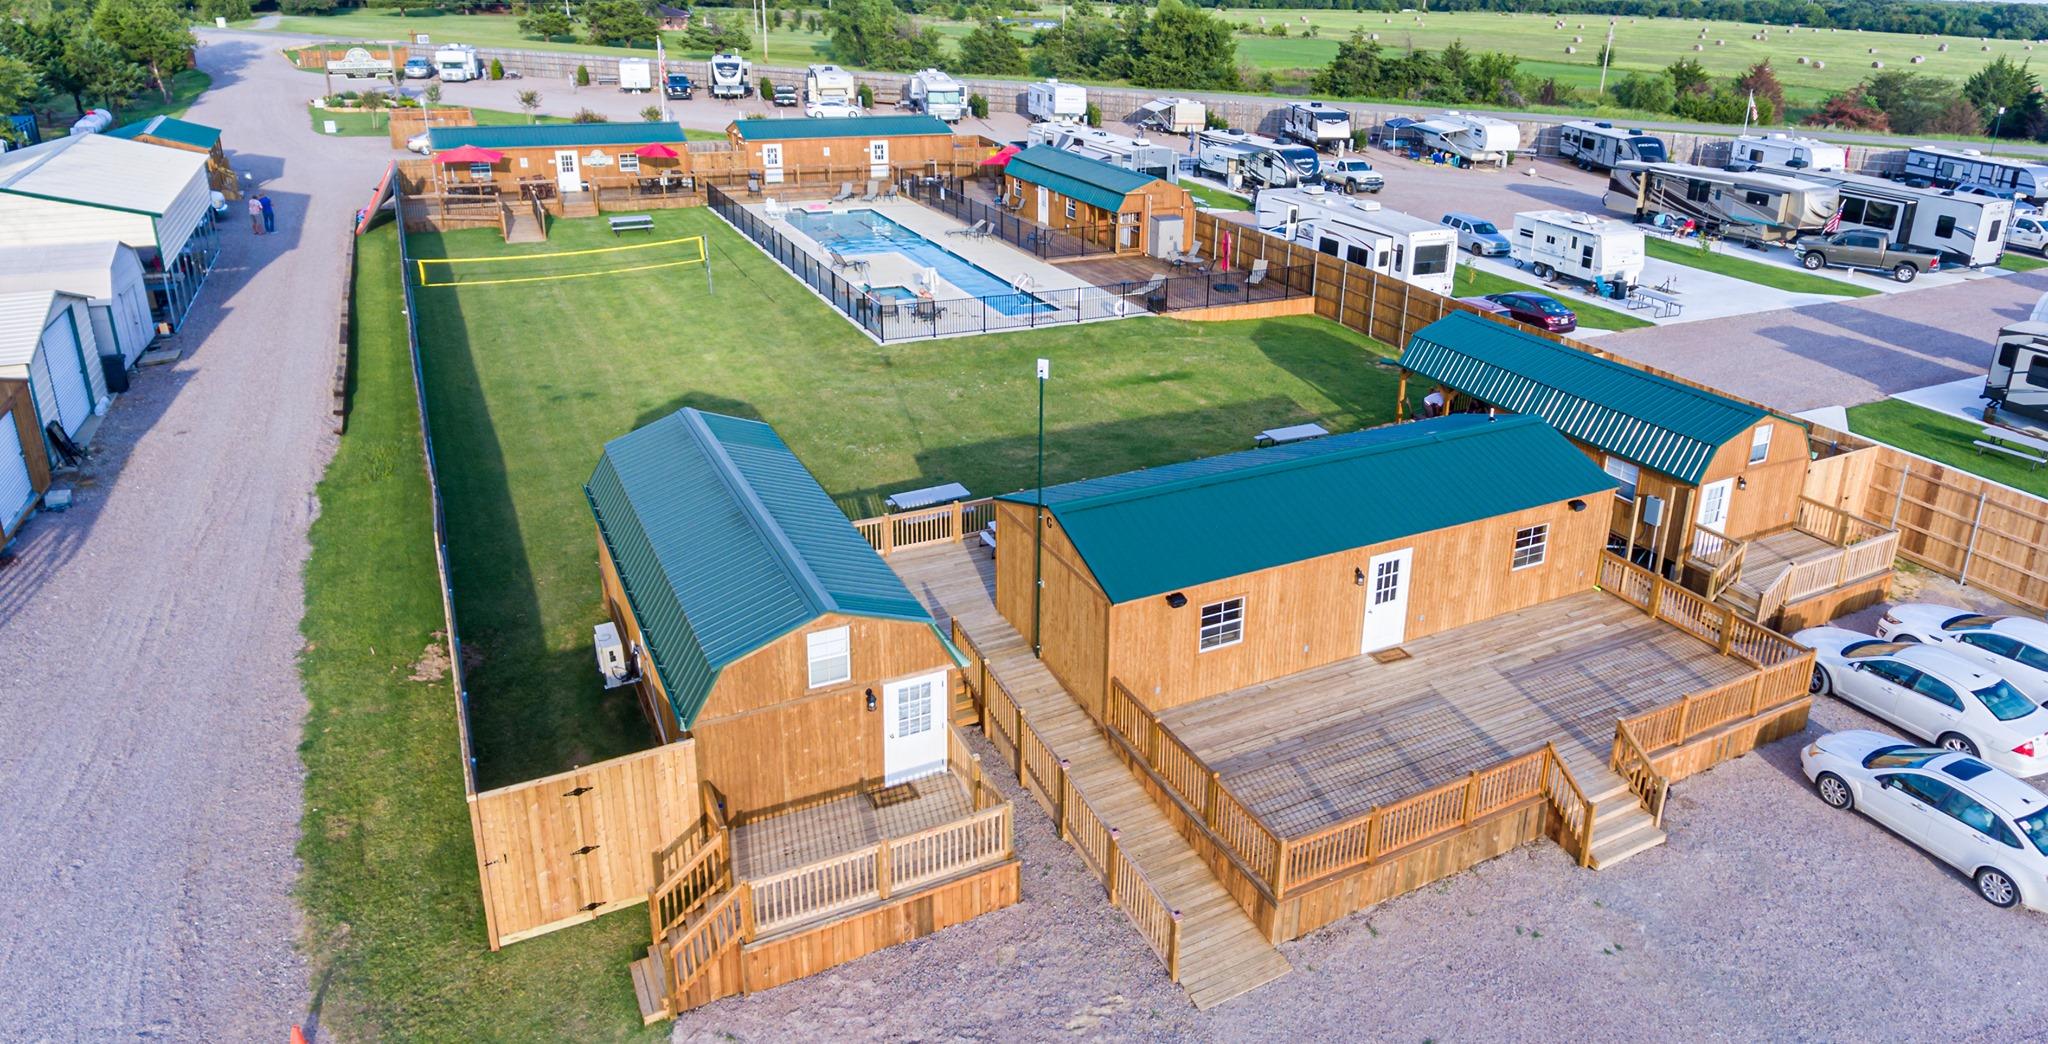 Do Drop Inn RV Resort and Cabins